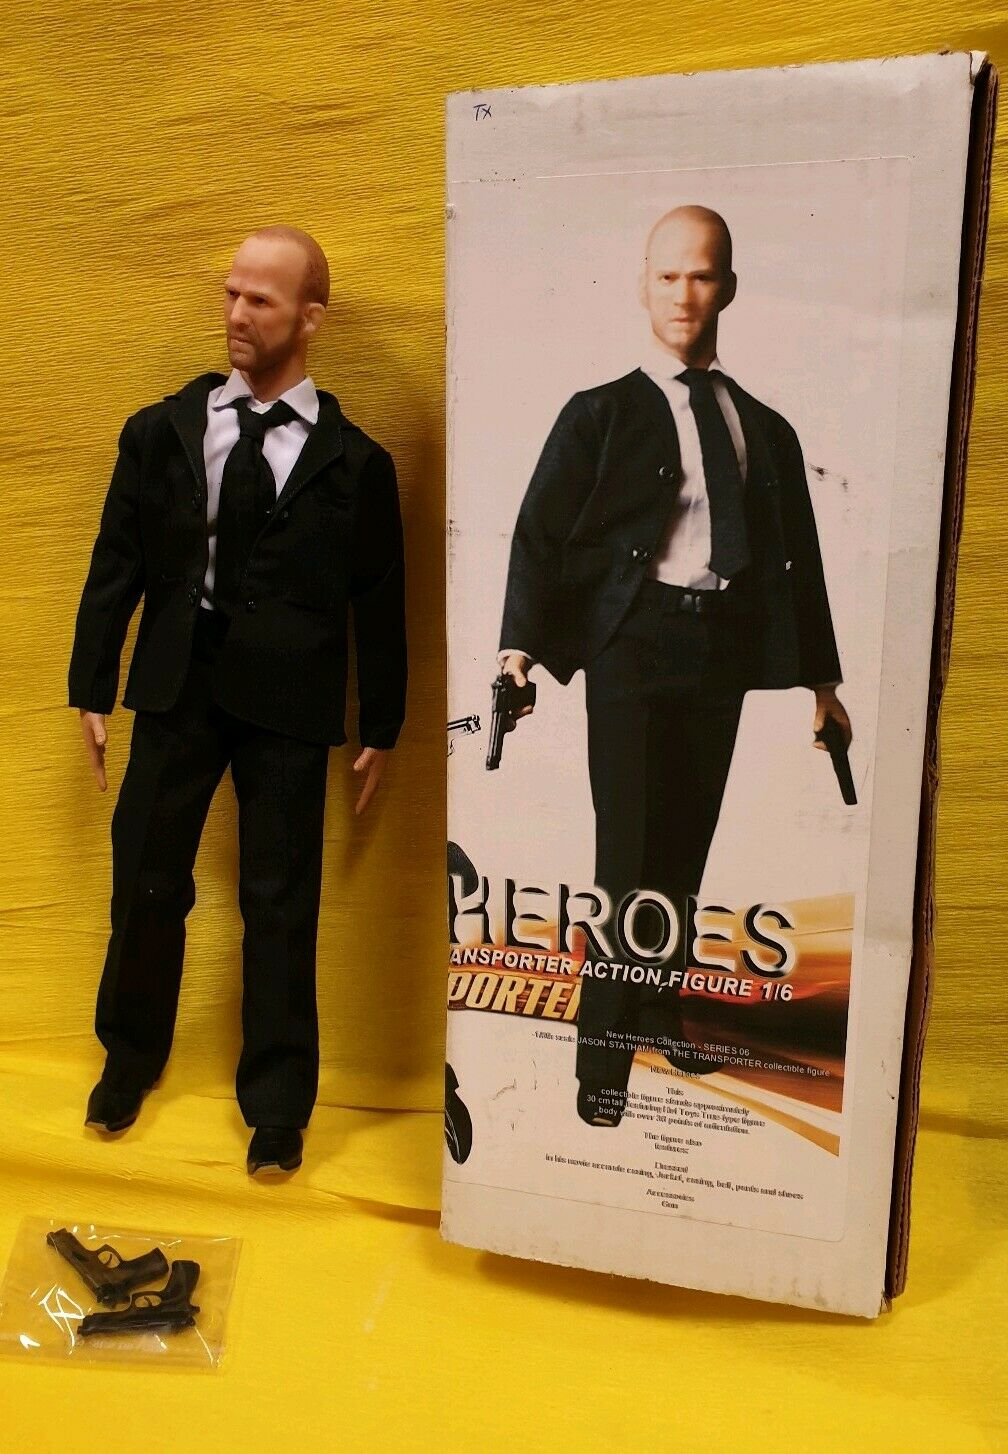 JASON STATHAM TRANSPORTER F MARTIN NEW HEROES HOT ACTION FIGURE TOYS 12 doll 1.6